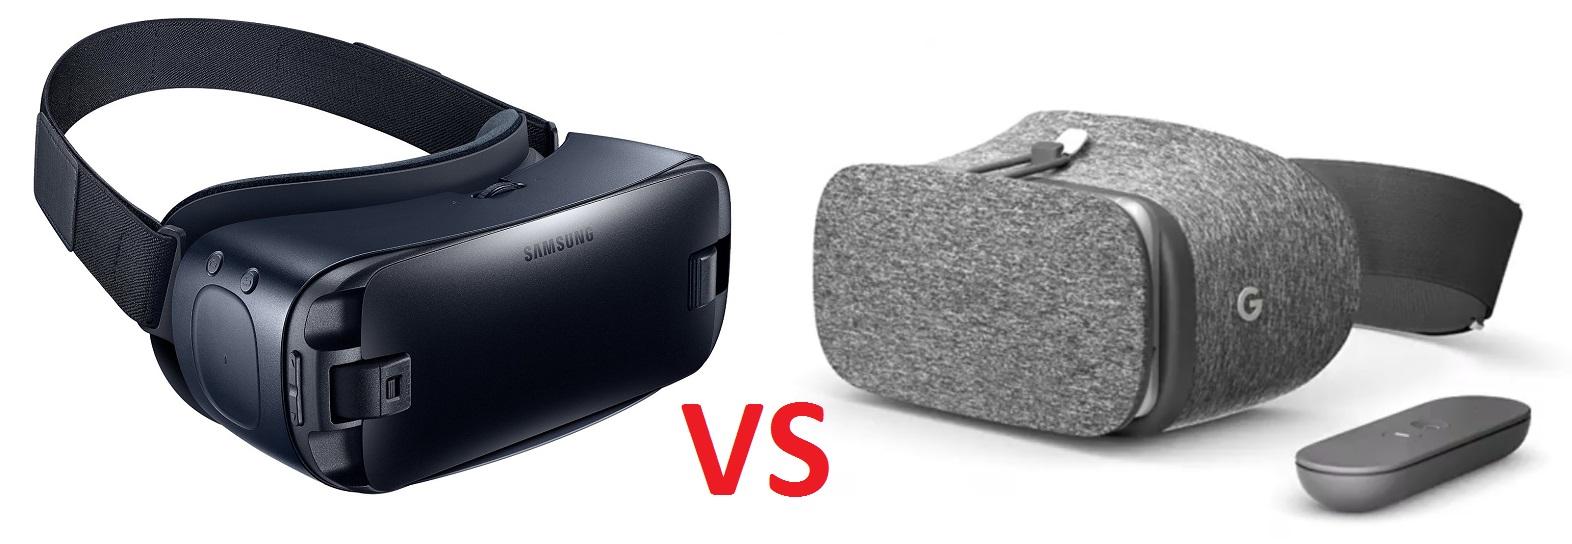 Samsung Gear VR vs Google Daydream View